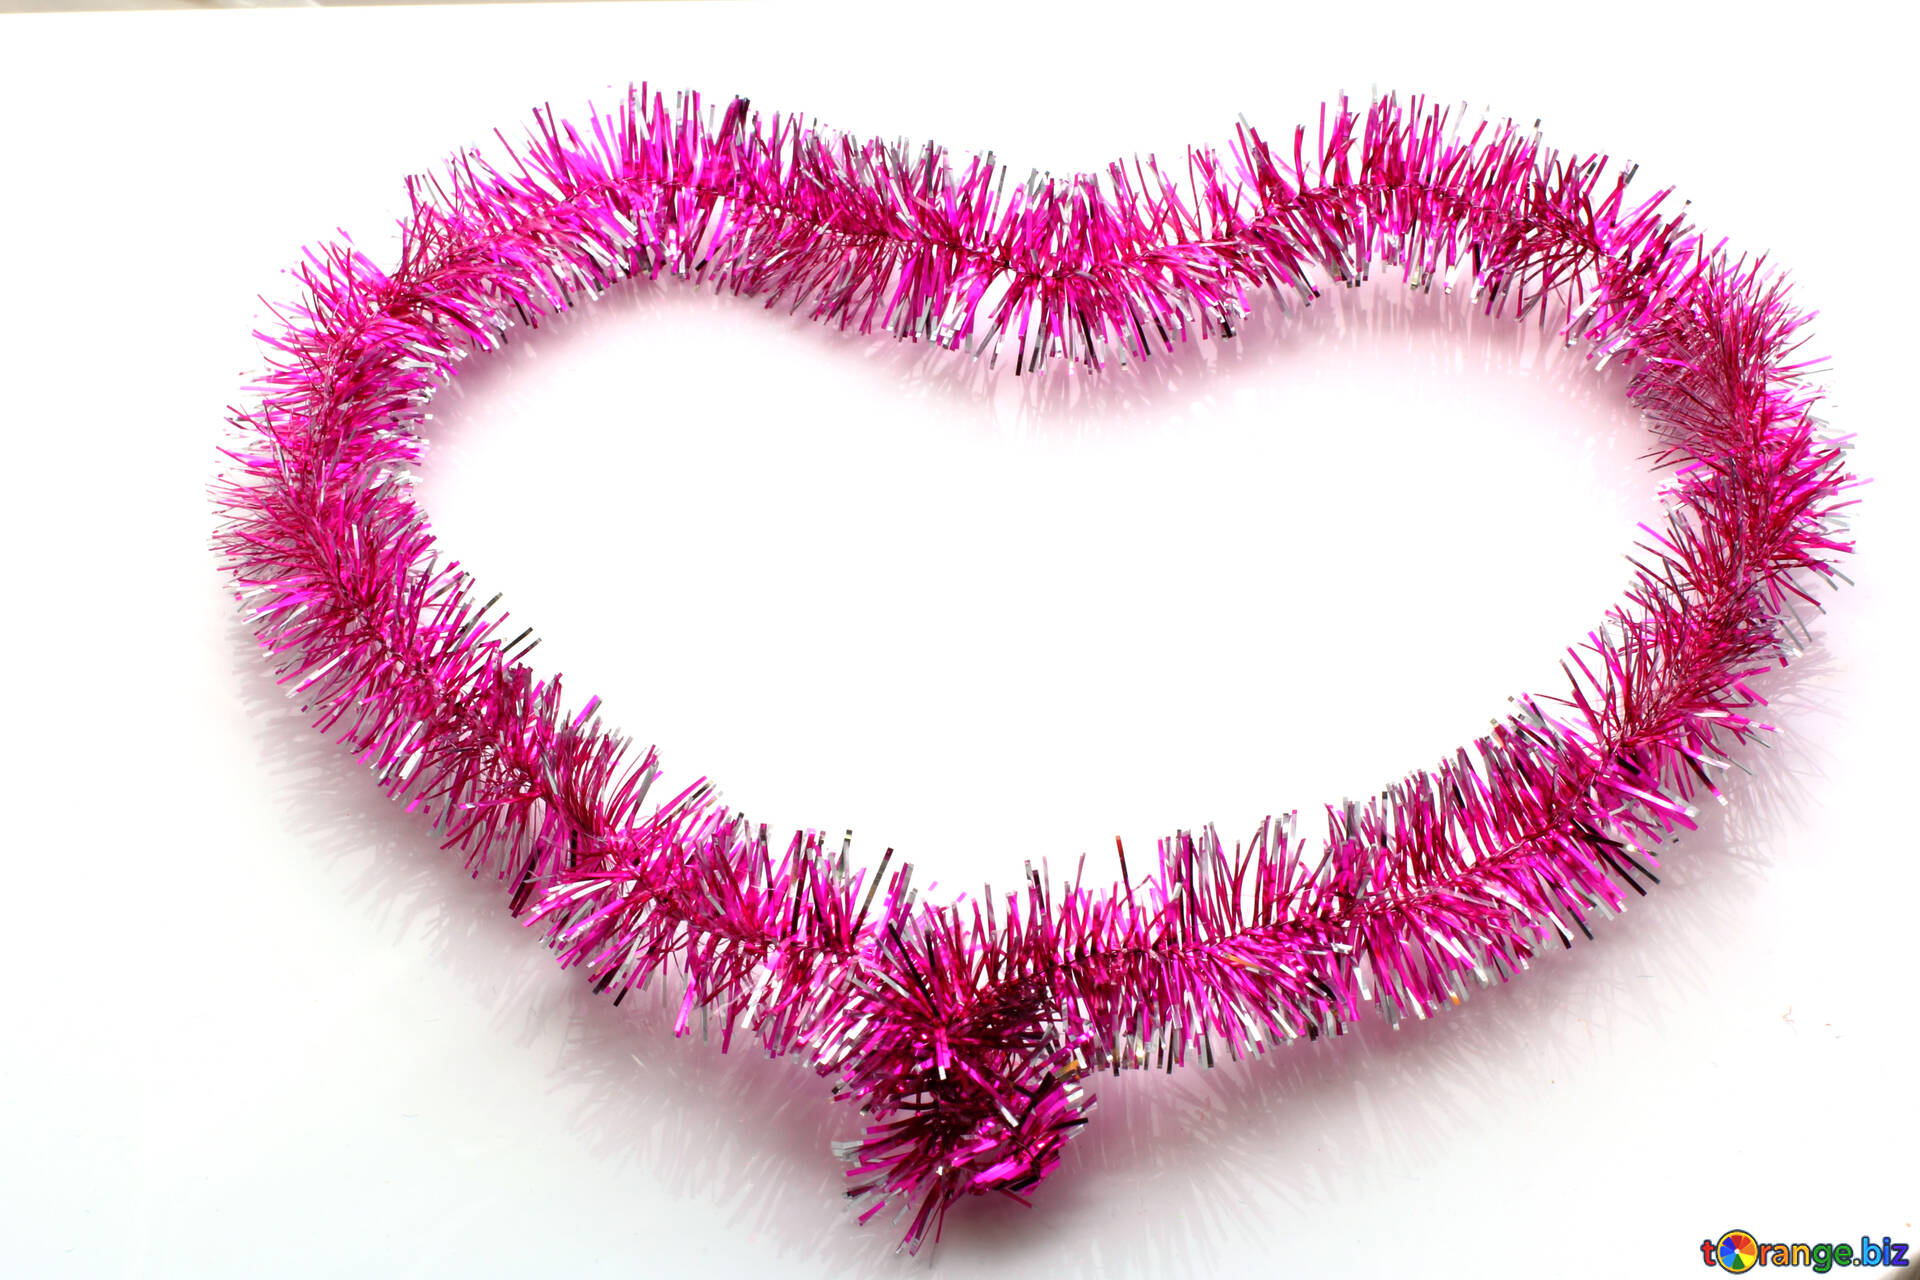 Heart of rope heart love new year heart № 16375